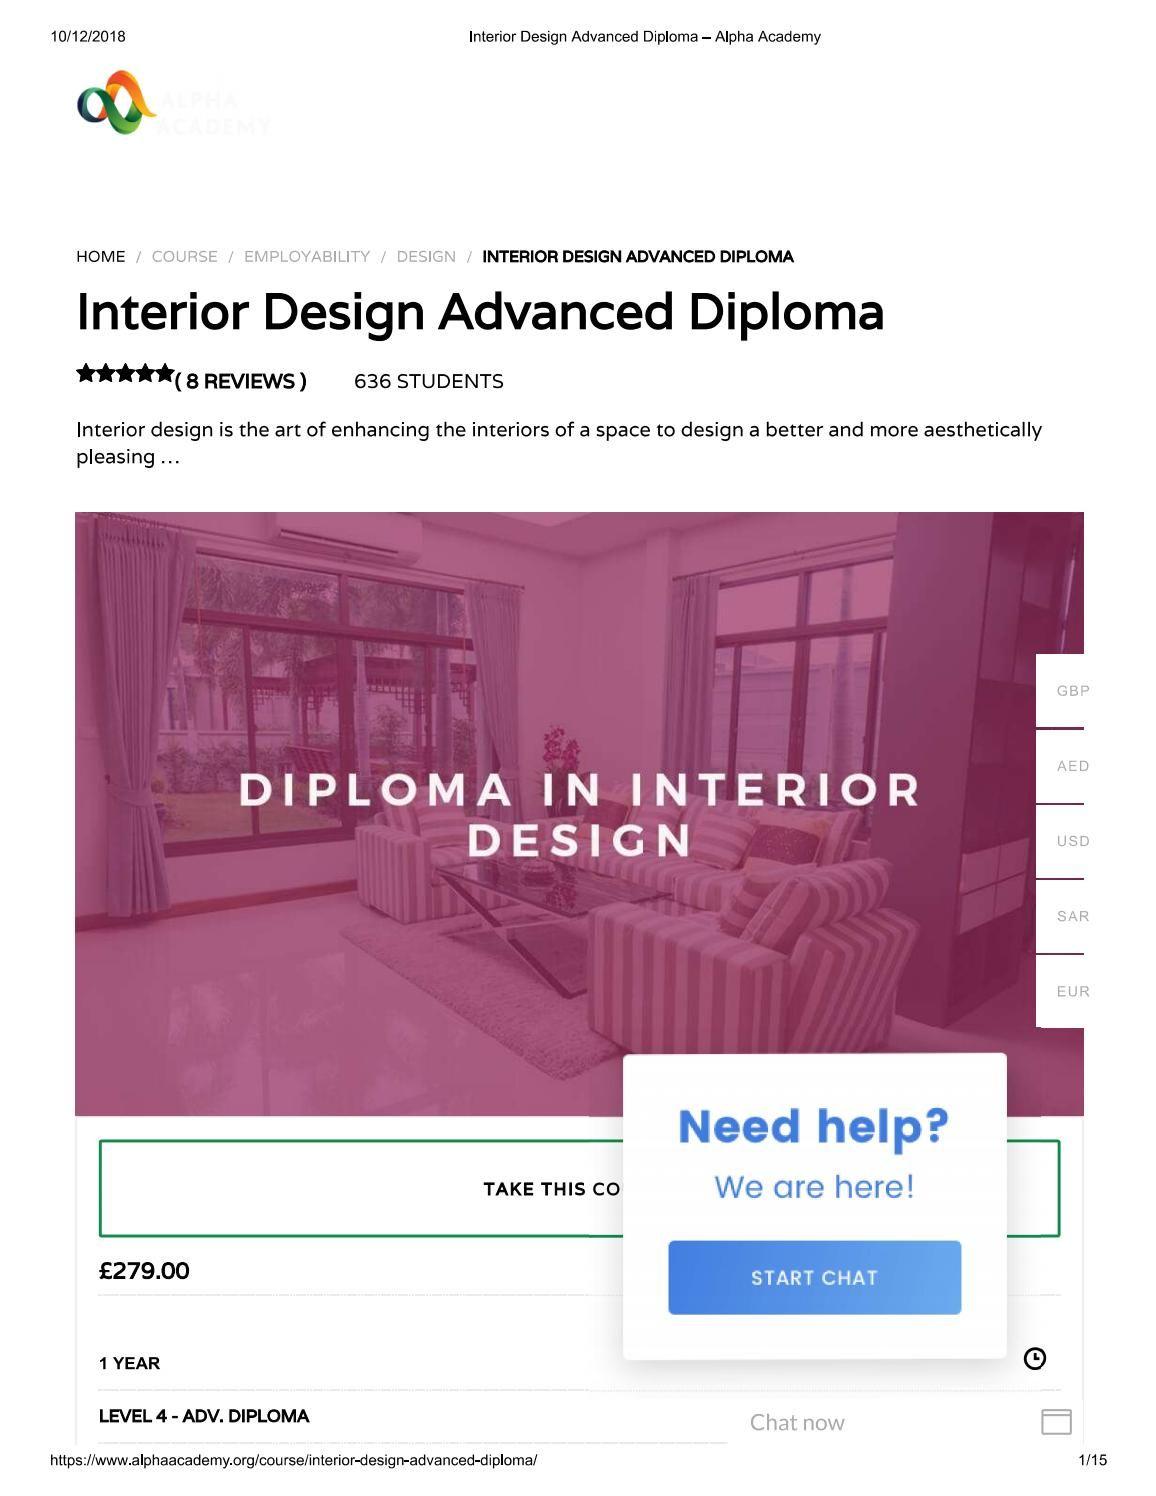 Interior Design Advanced Diploma Alpha Academy Design